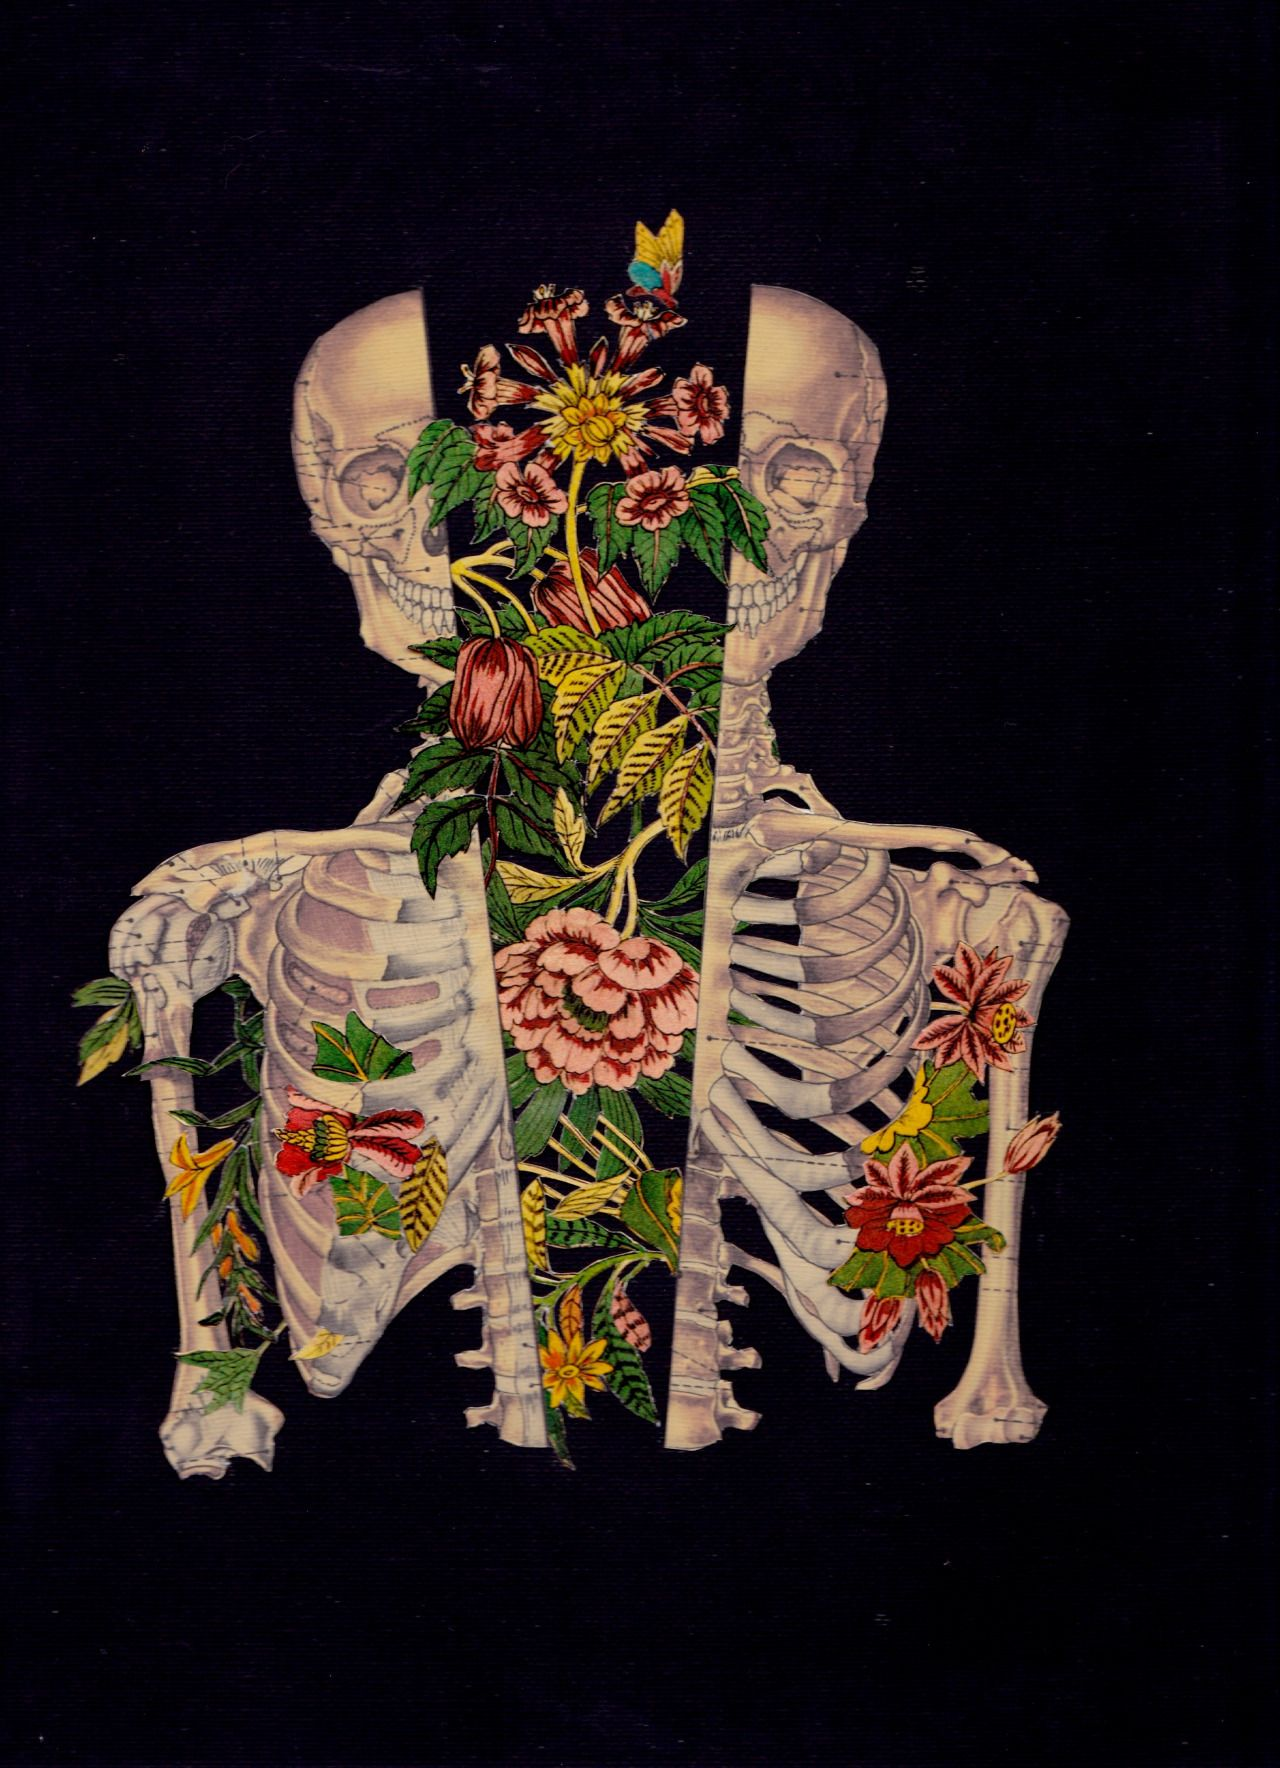 Bedelgeuse Collage Artworkcollage Ideaswho